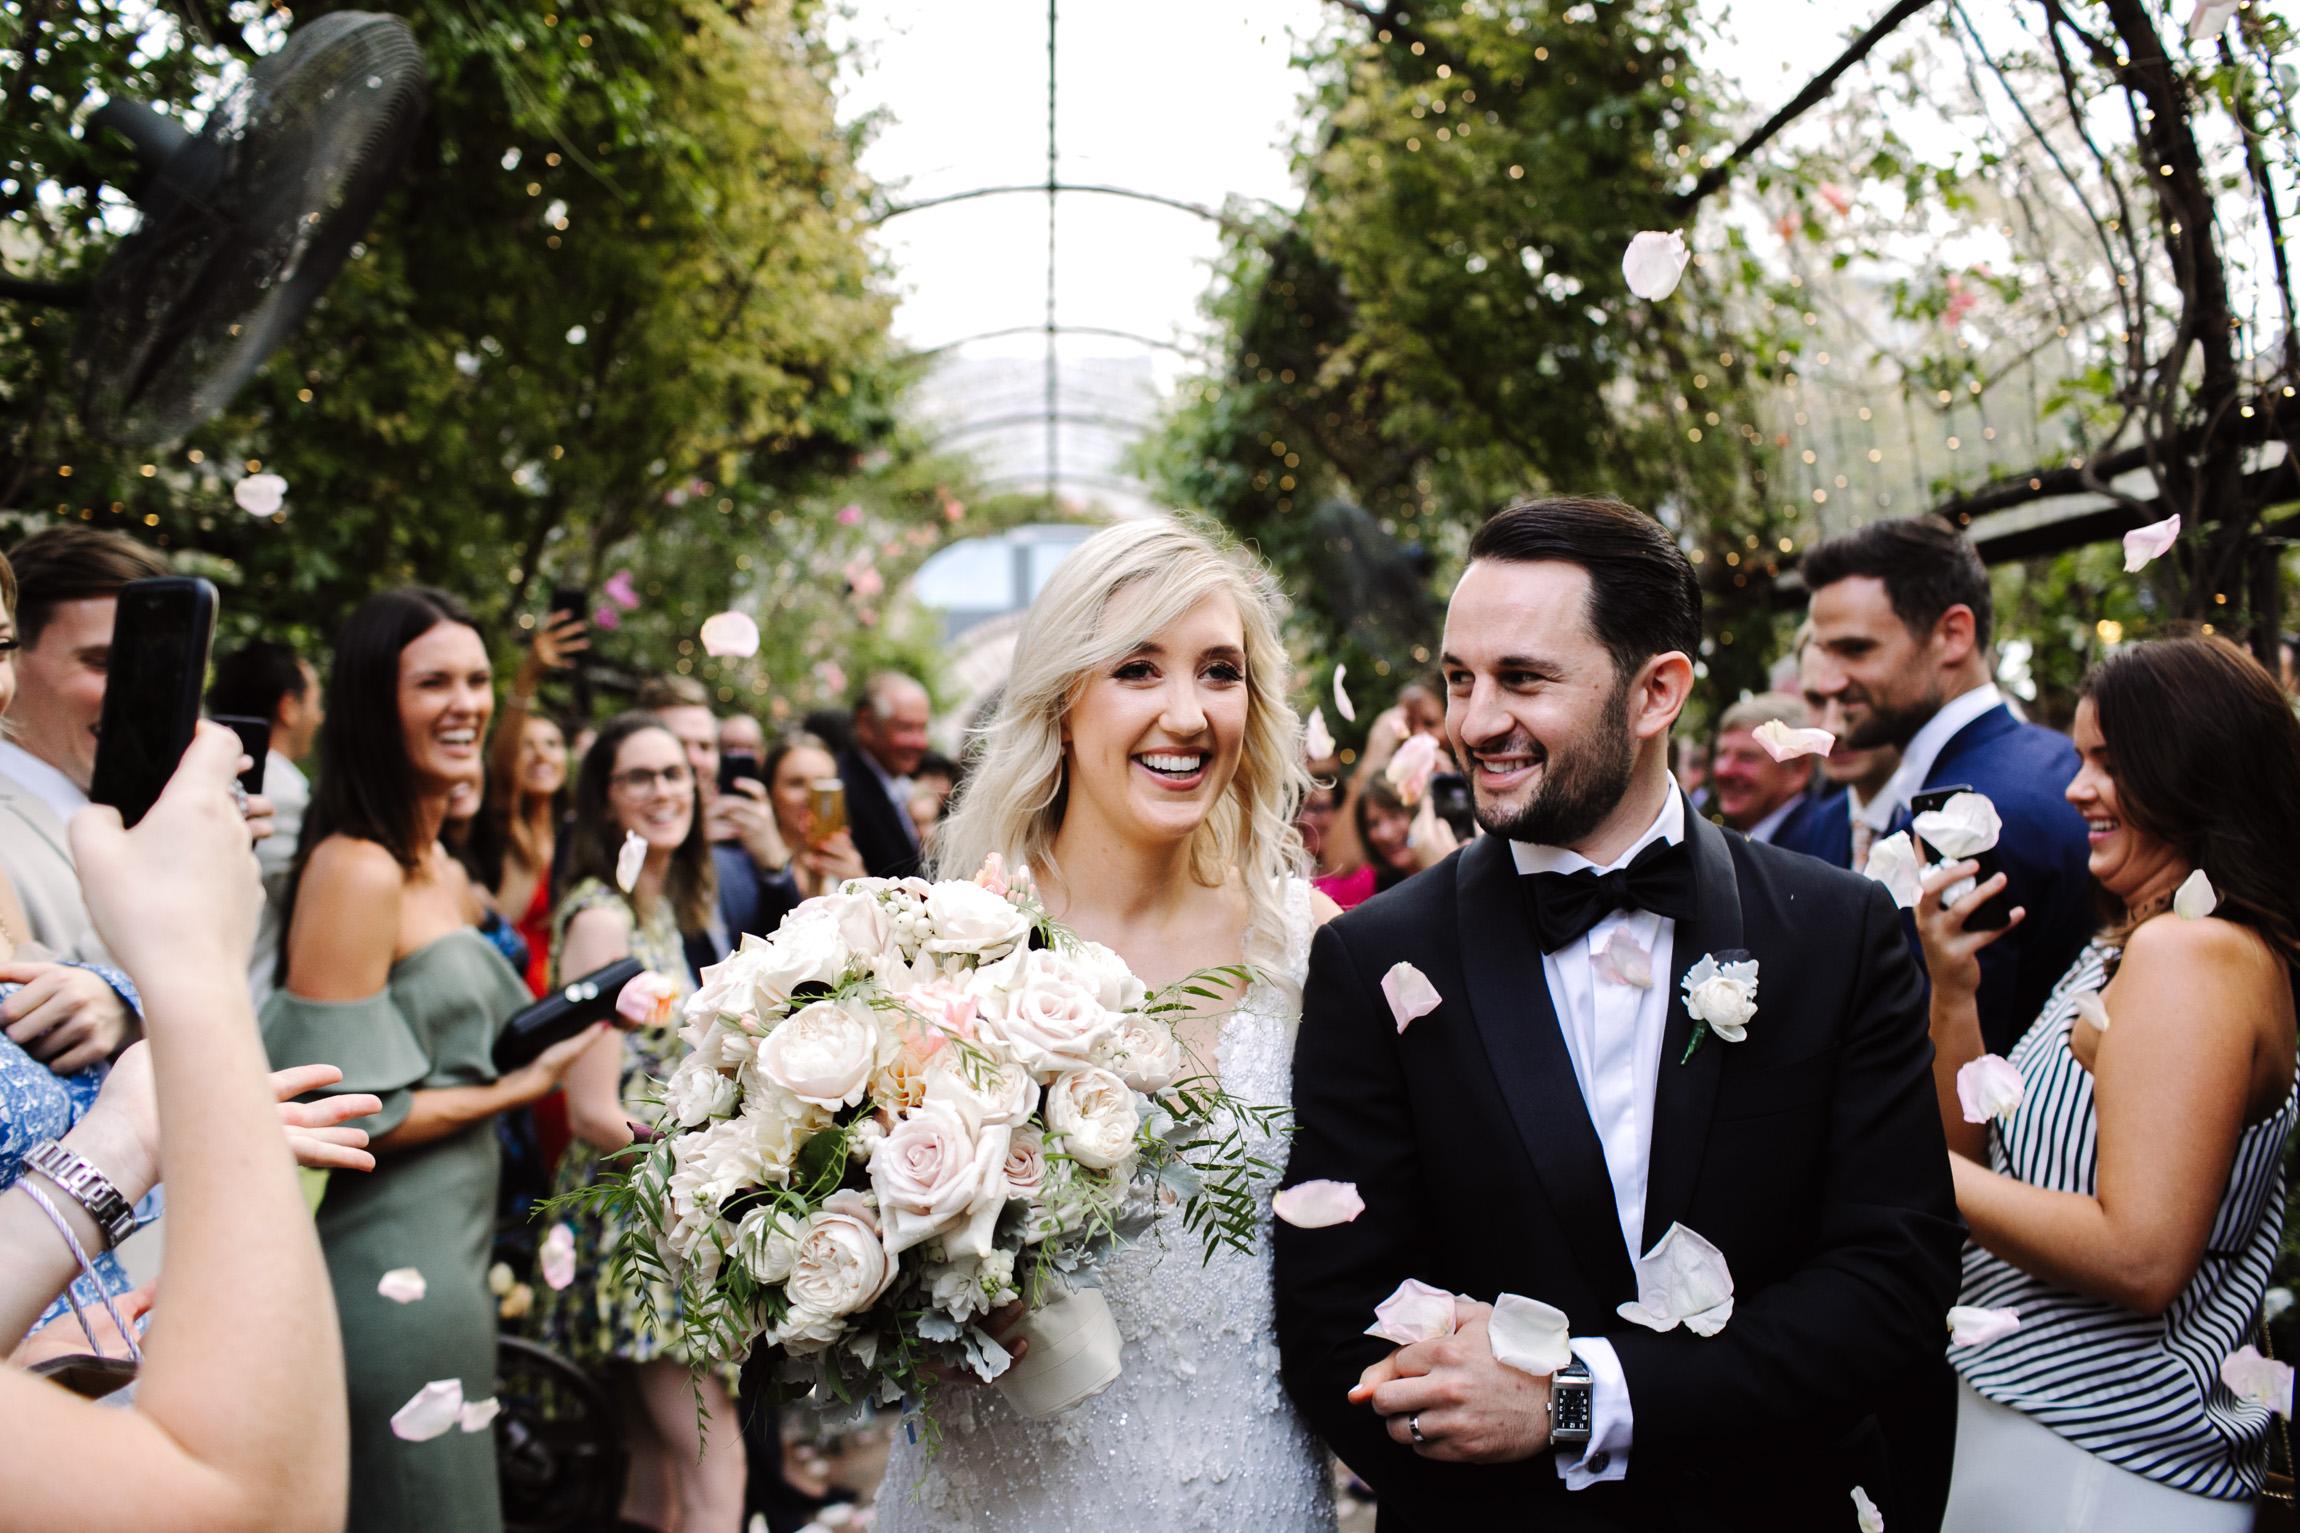 180223_justinaaron_wedding_charlotte_david_h-143.jpg